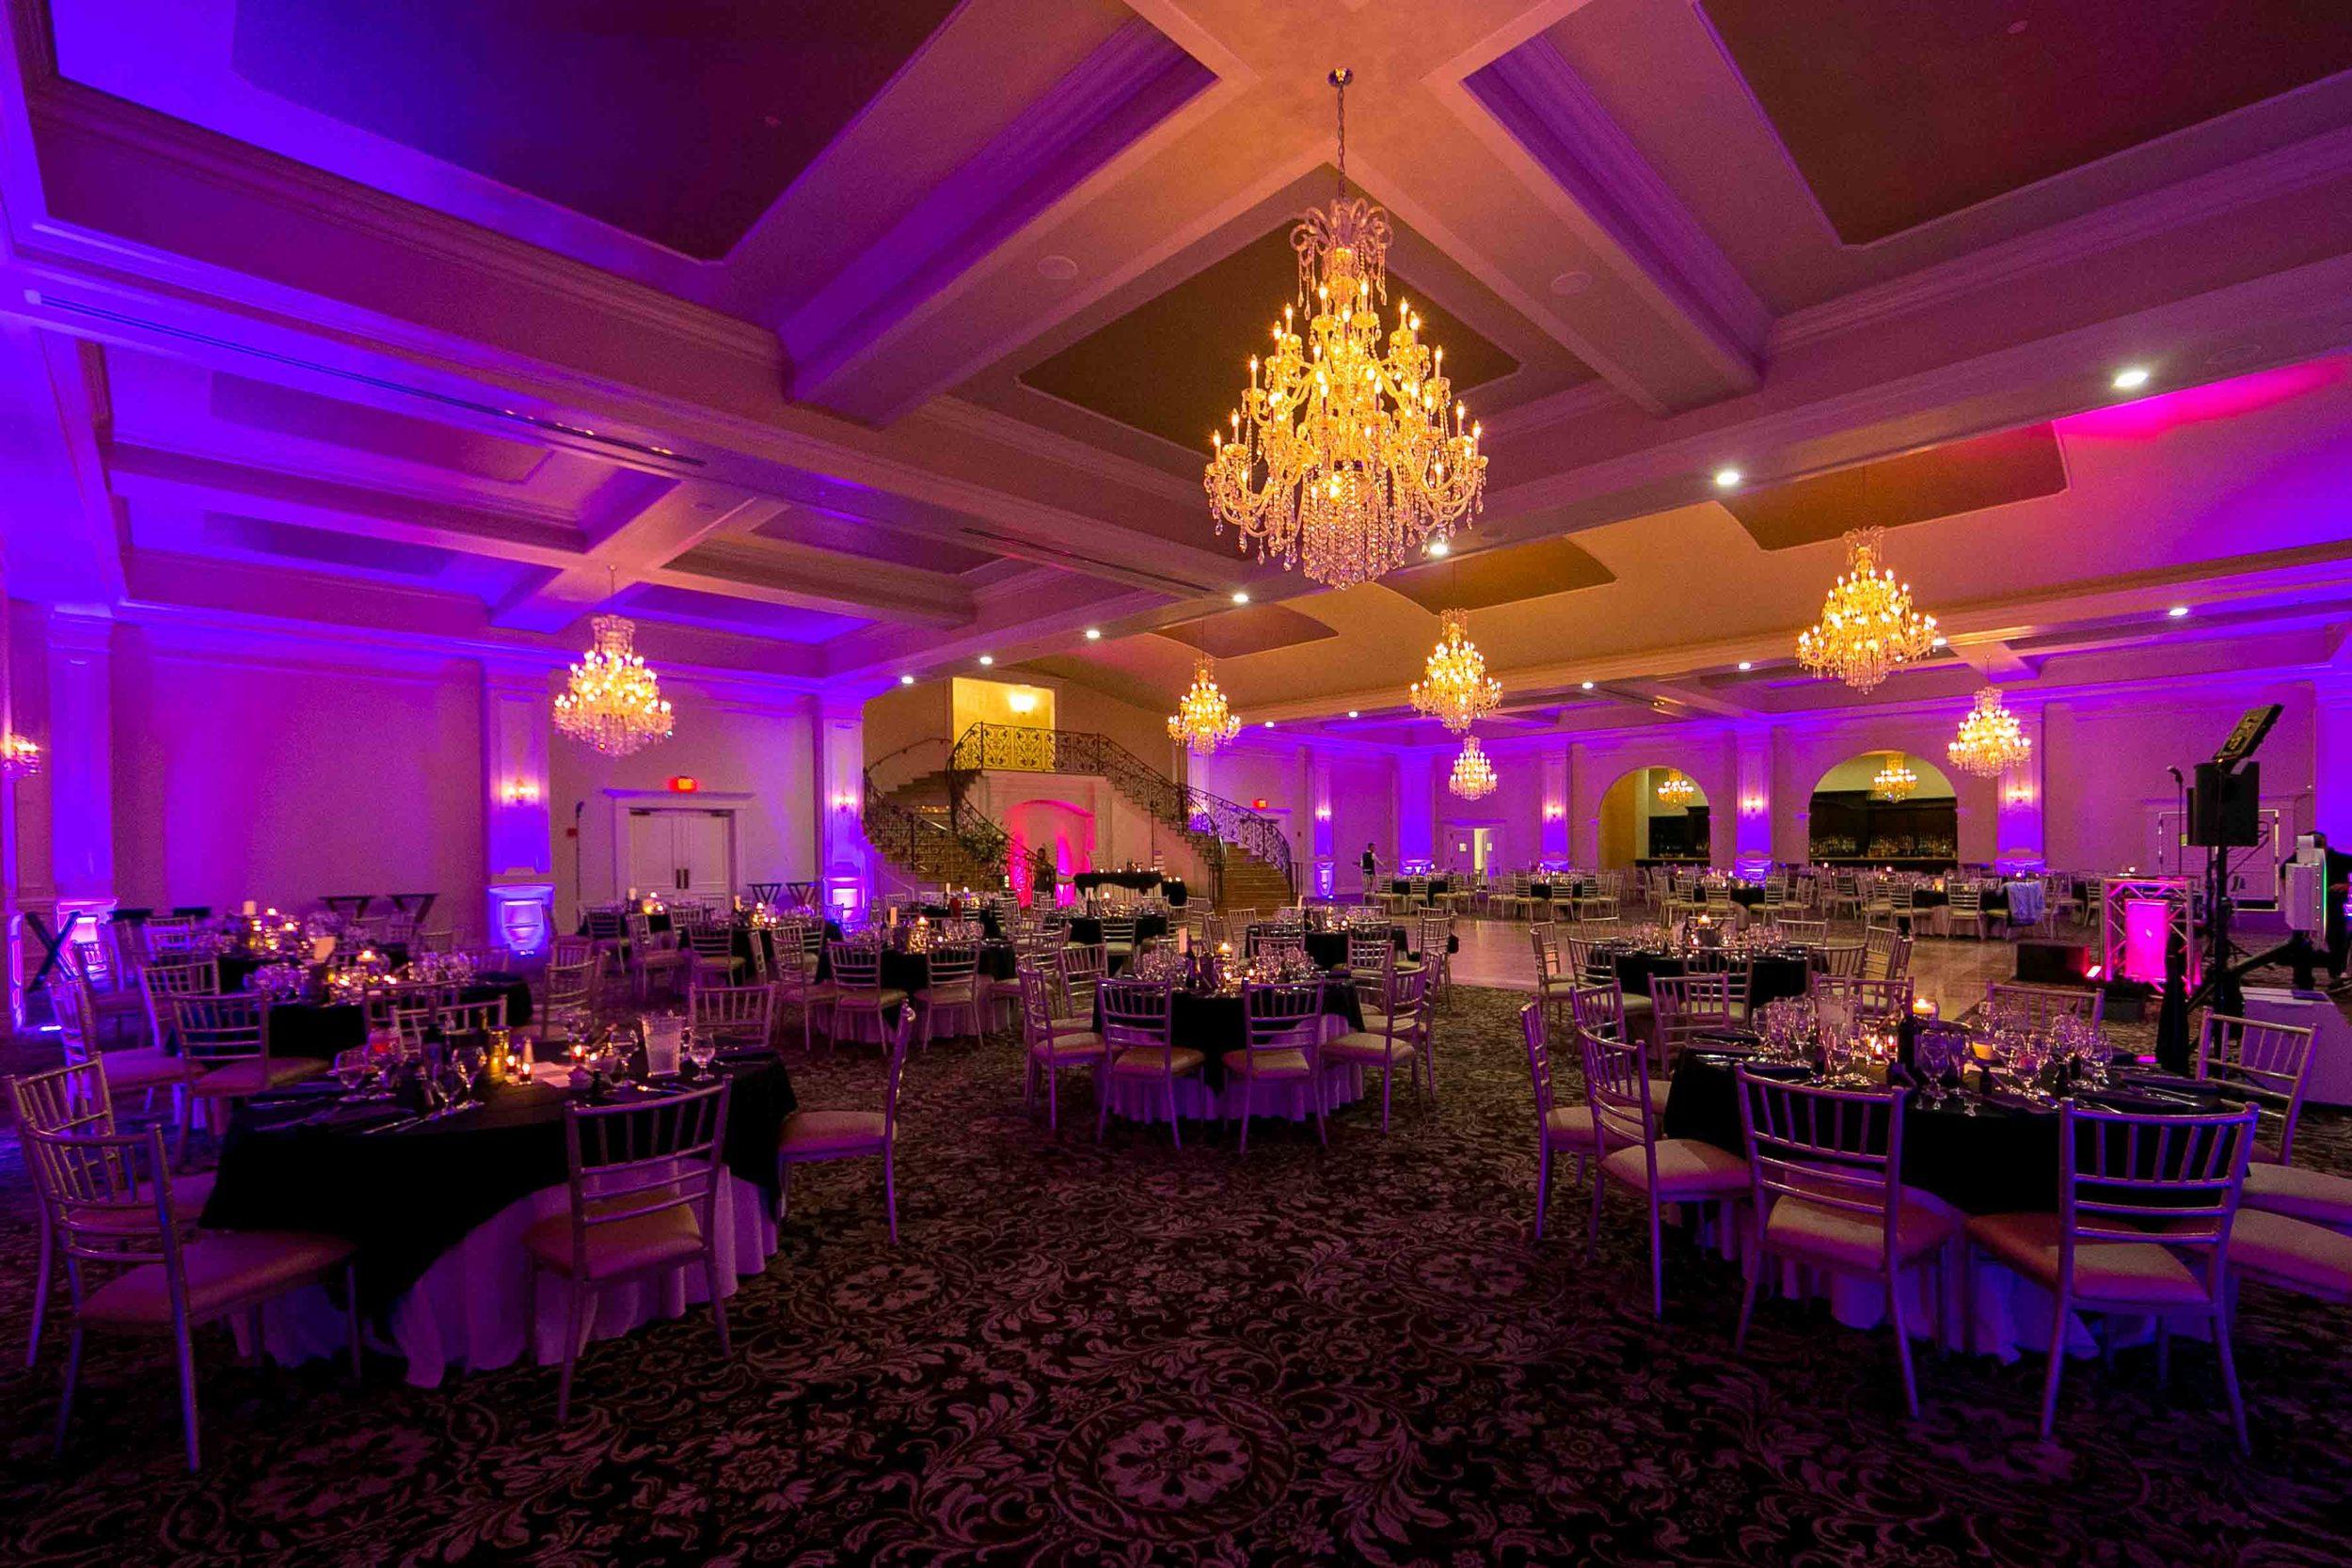 Italian Wedding at Aria Prospect CT Jacek Dolata